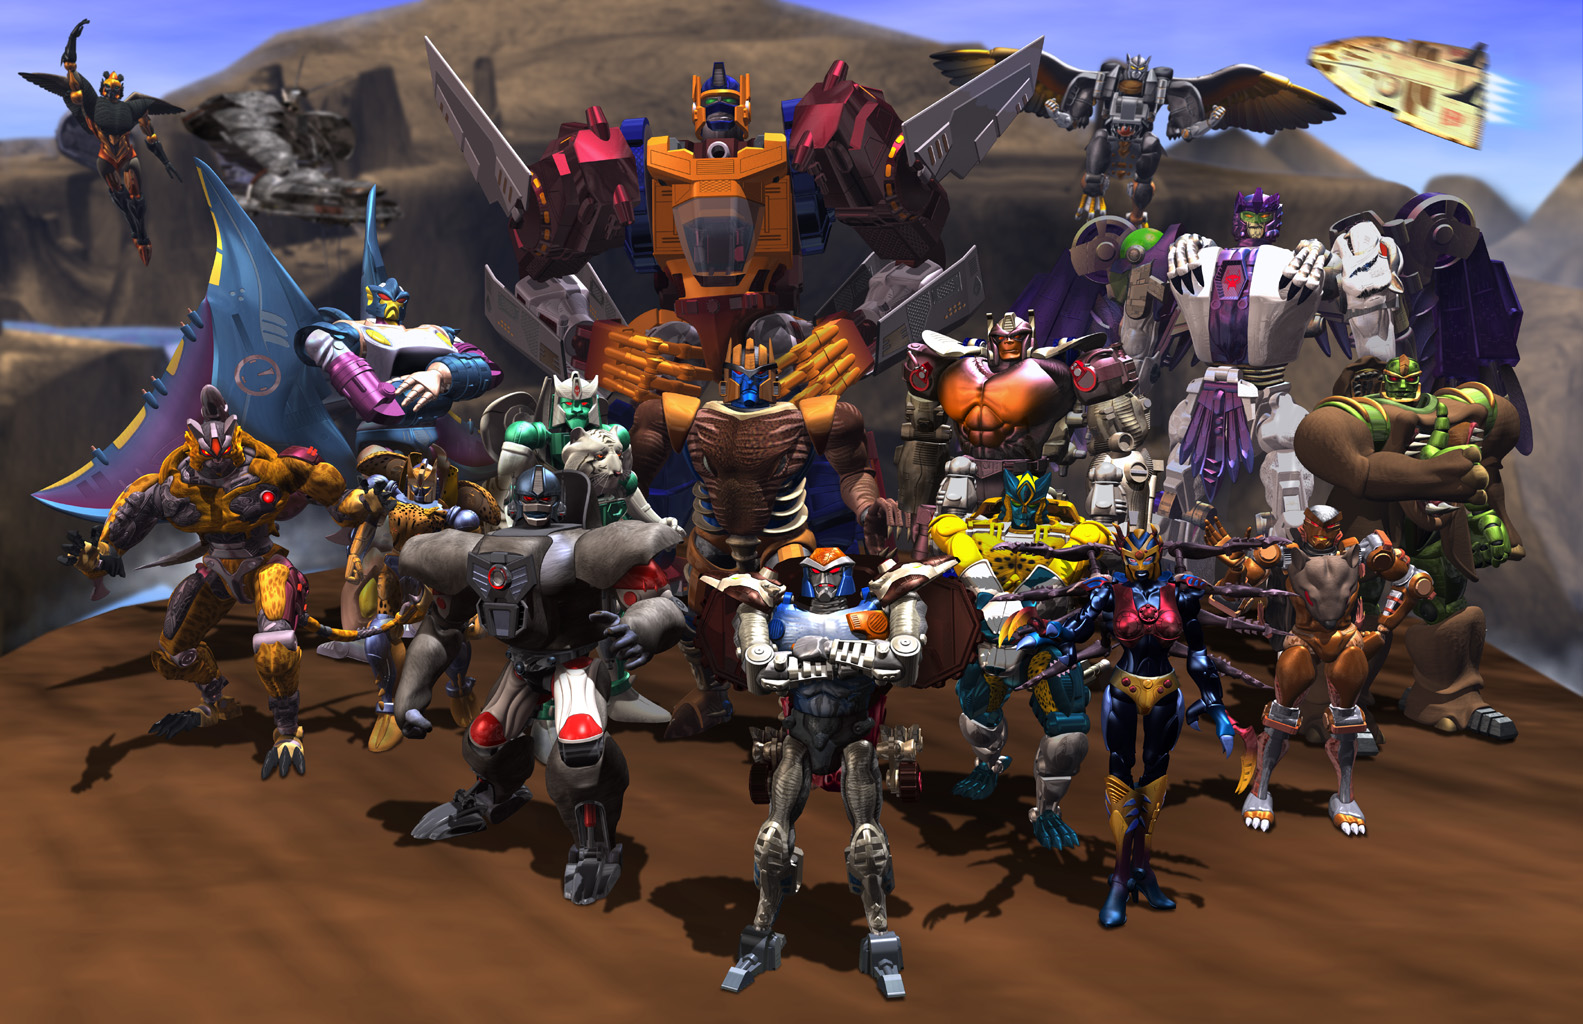 TV-program - Beast Wars  Beast Robot Bakgrund